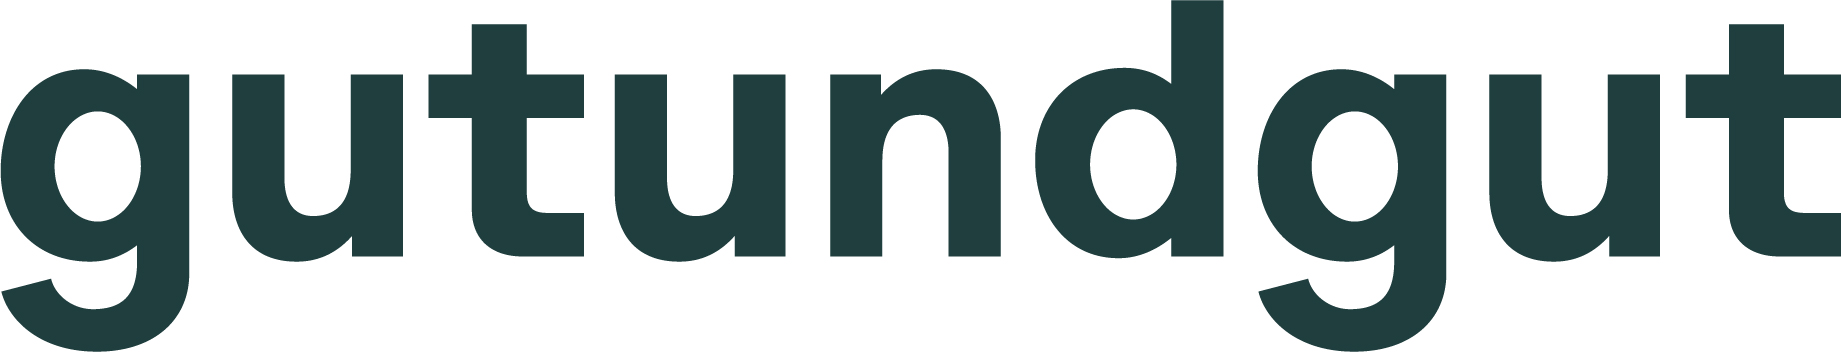 gutundgut_logo.jpg